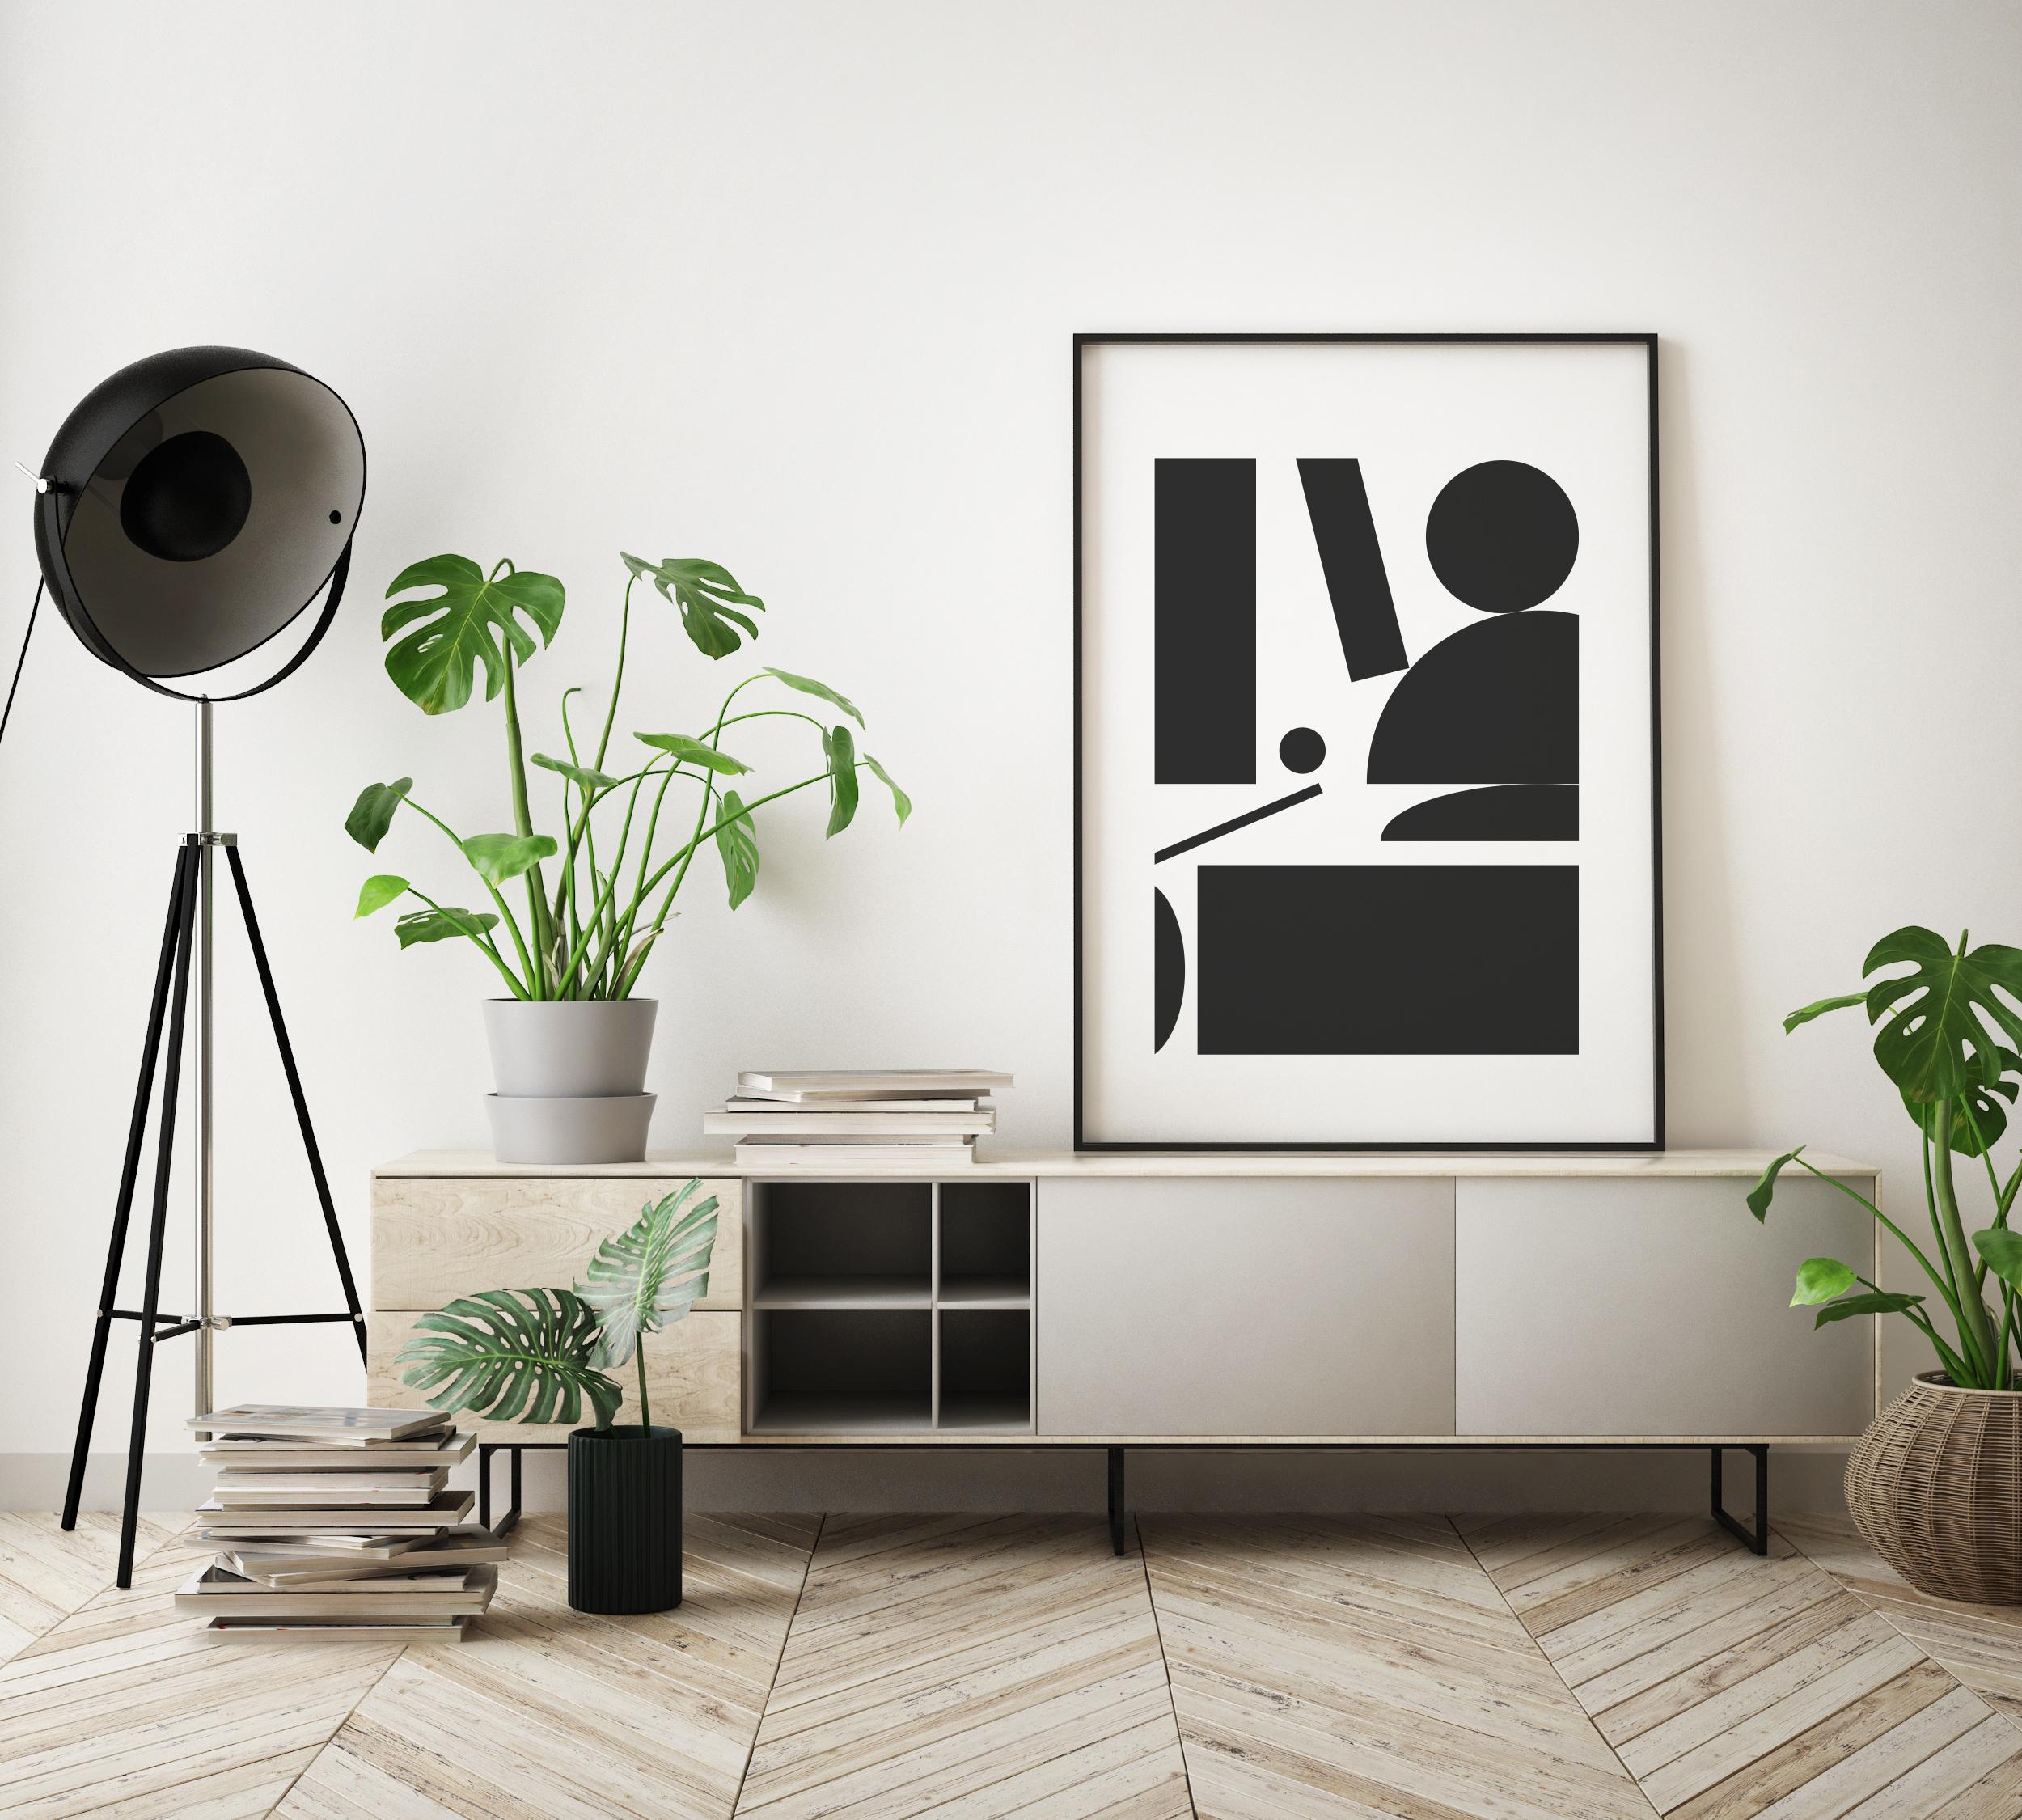 KitBag01-blk-lifestyle-blklamp-sideboard.jpg